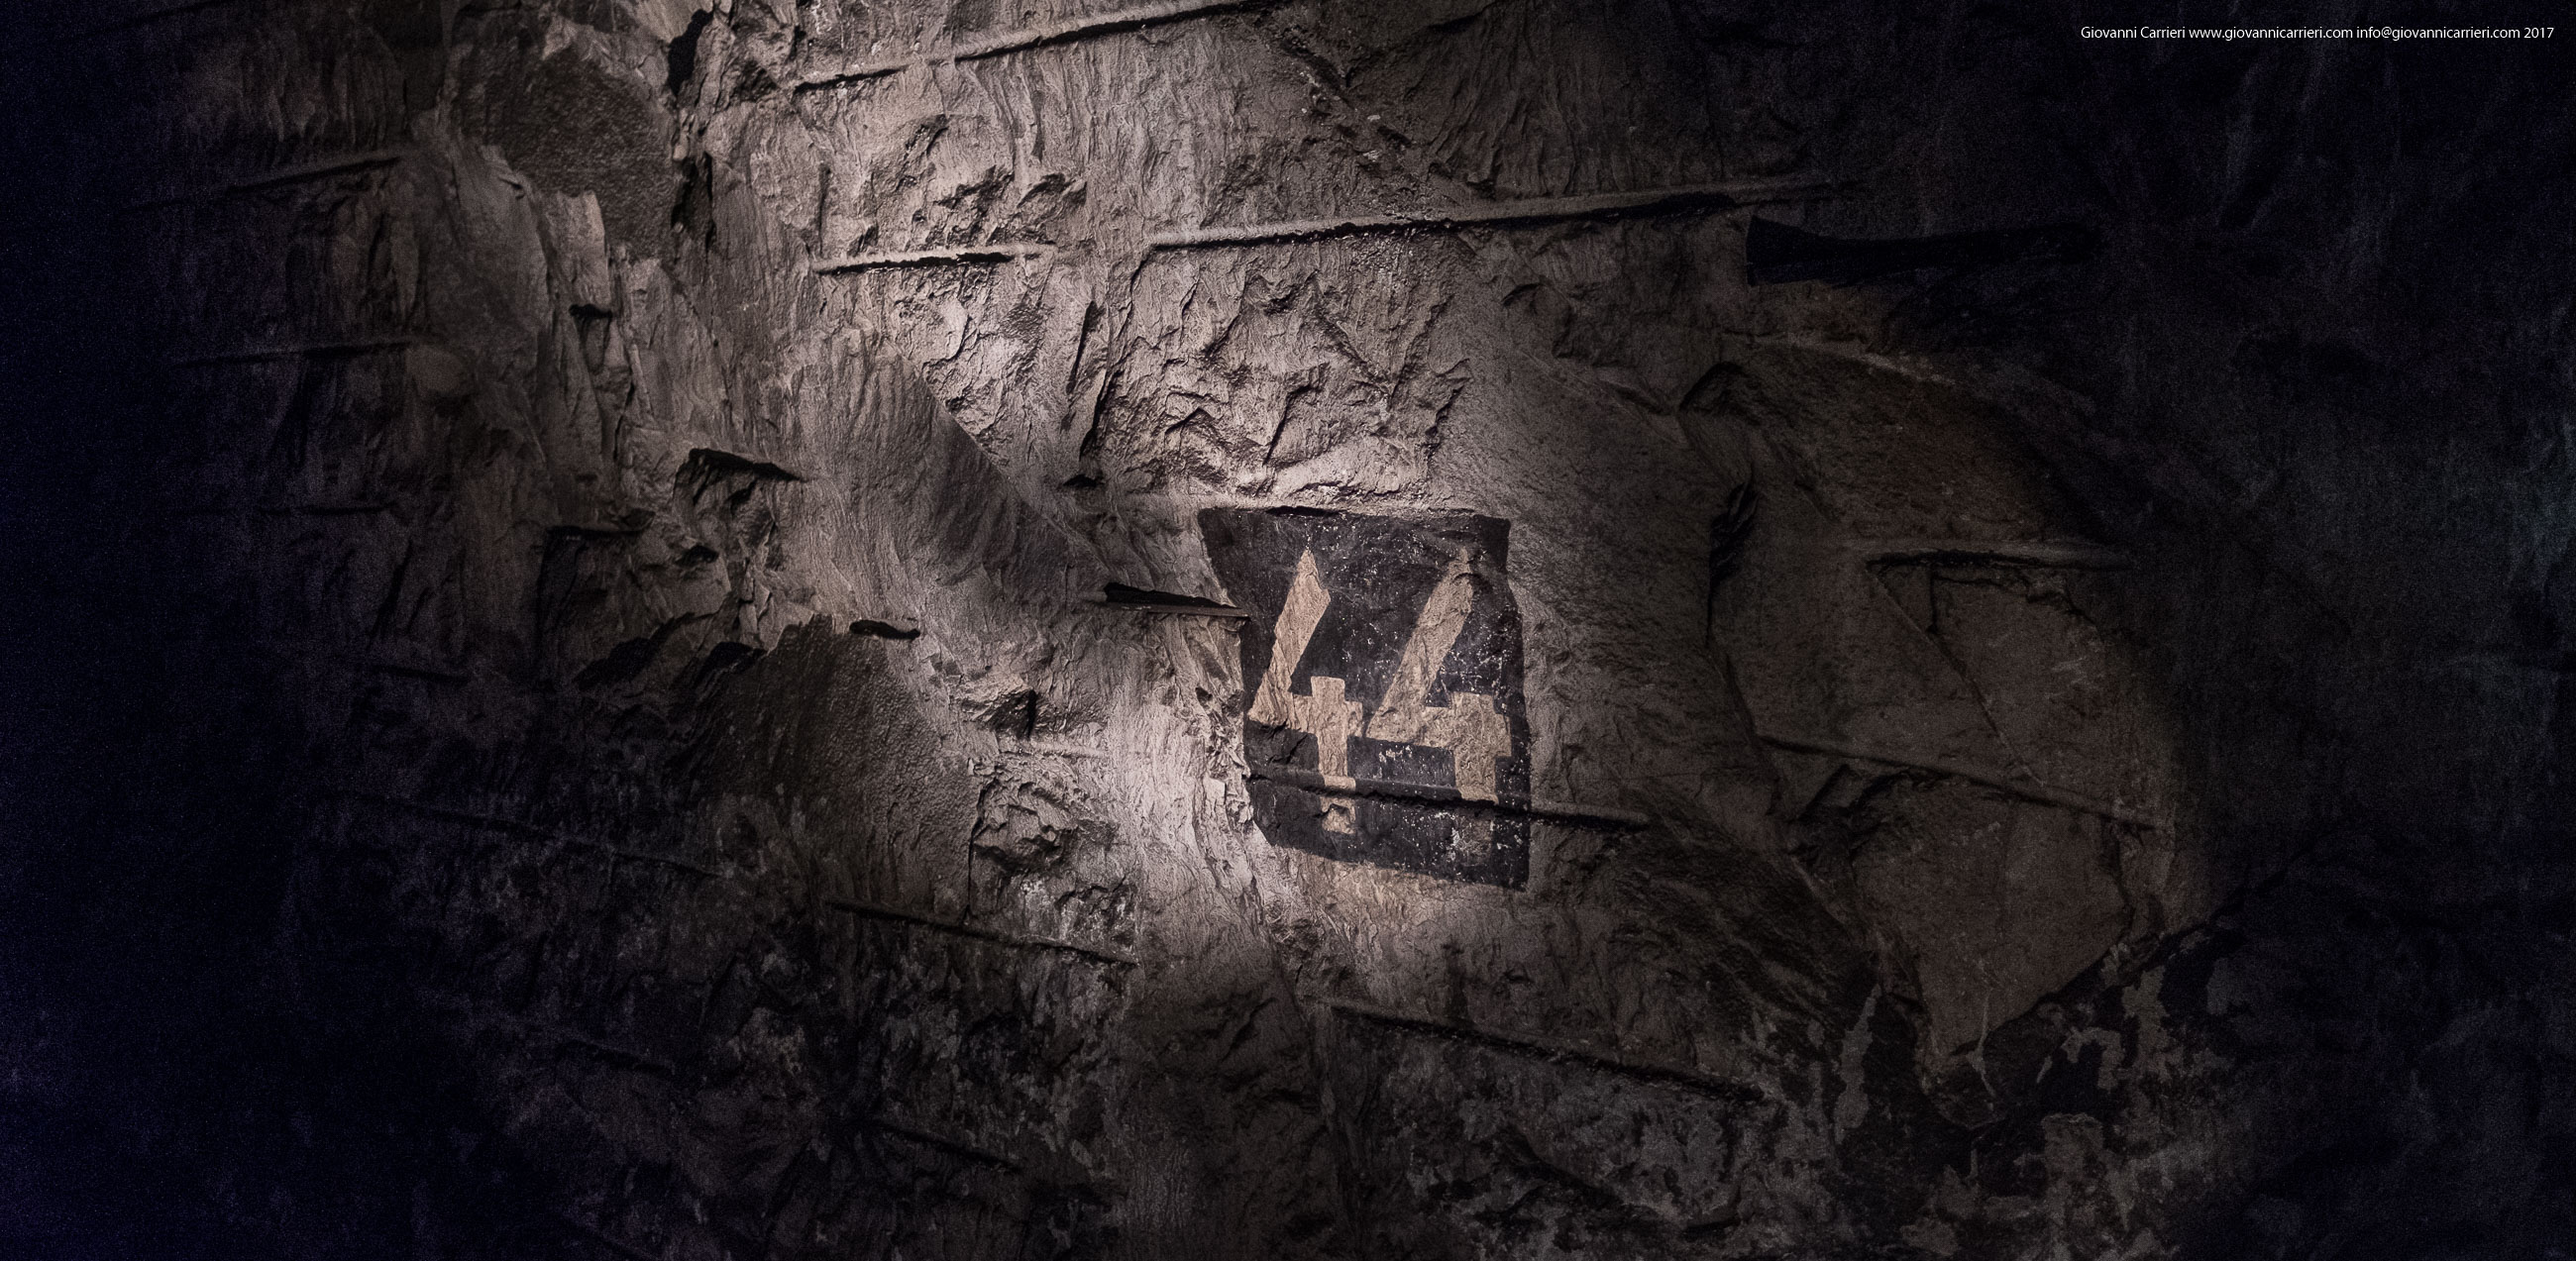 Insegne naziste nel bunker, Mittelbau-Dora